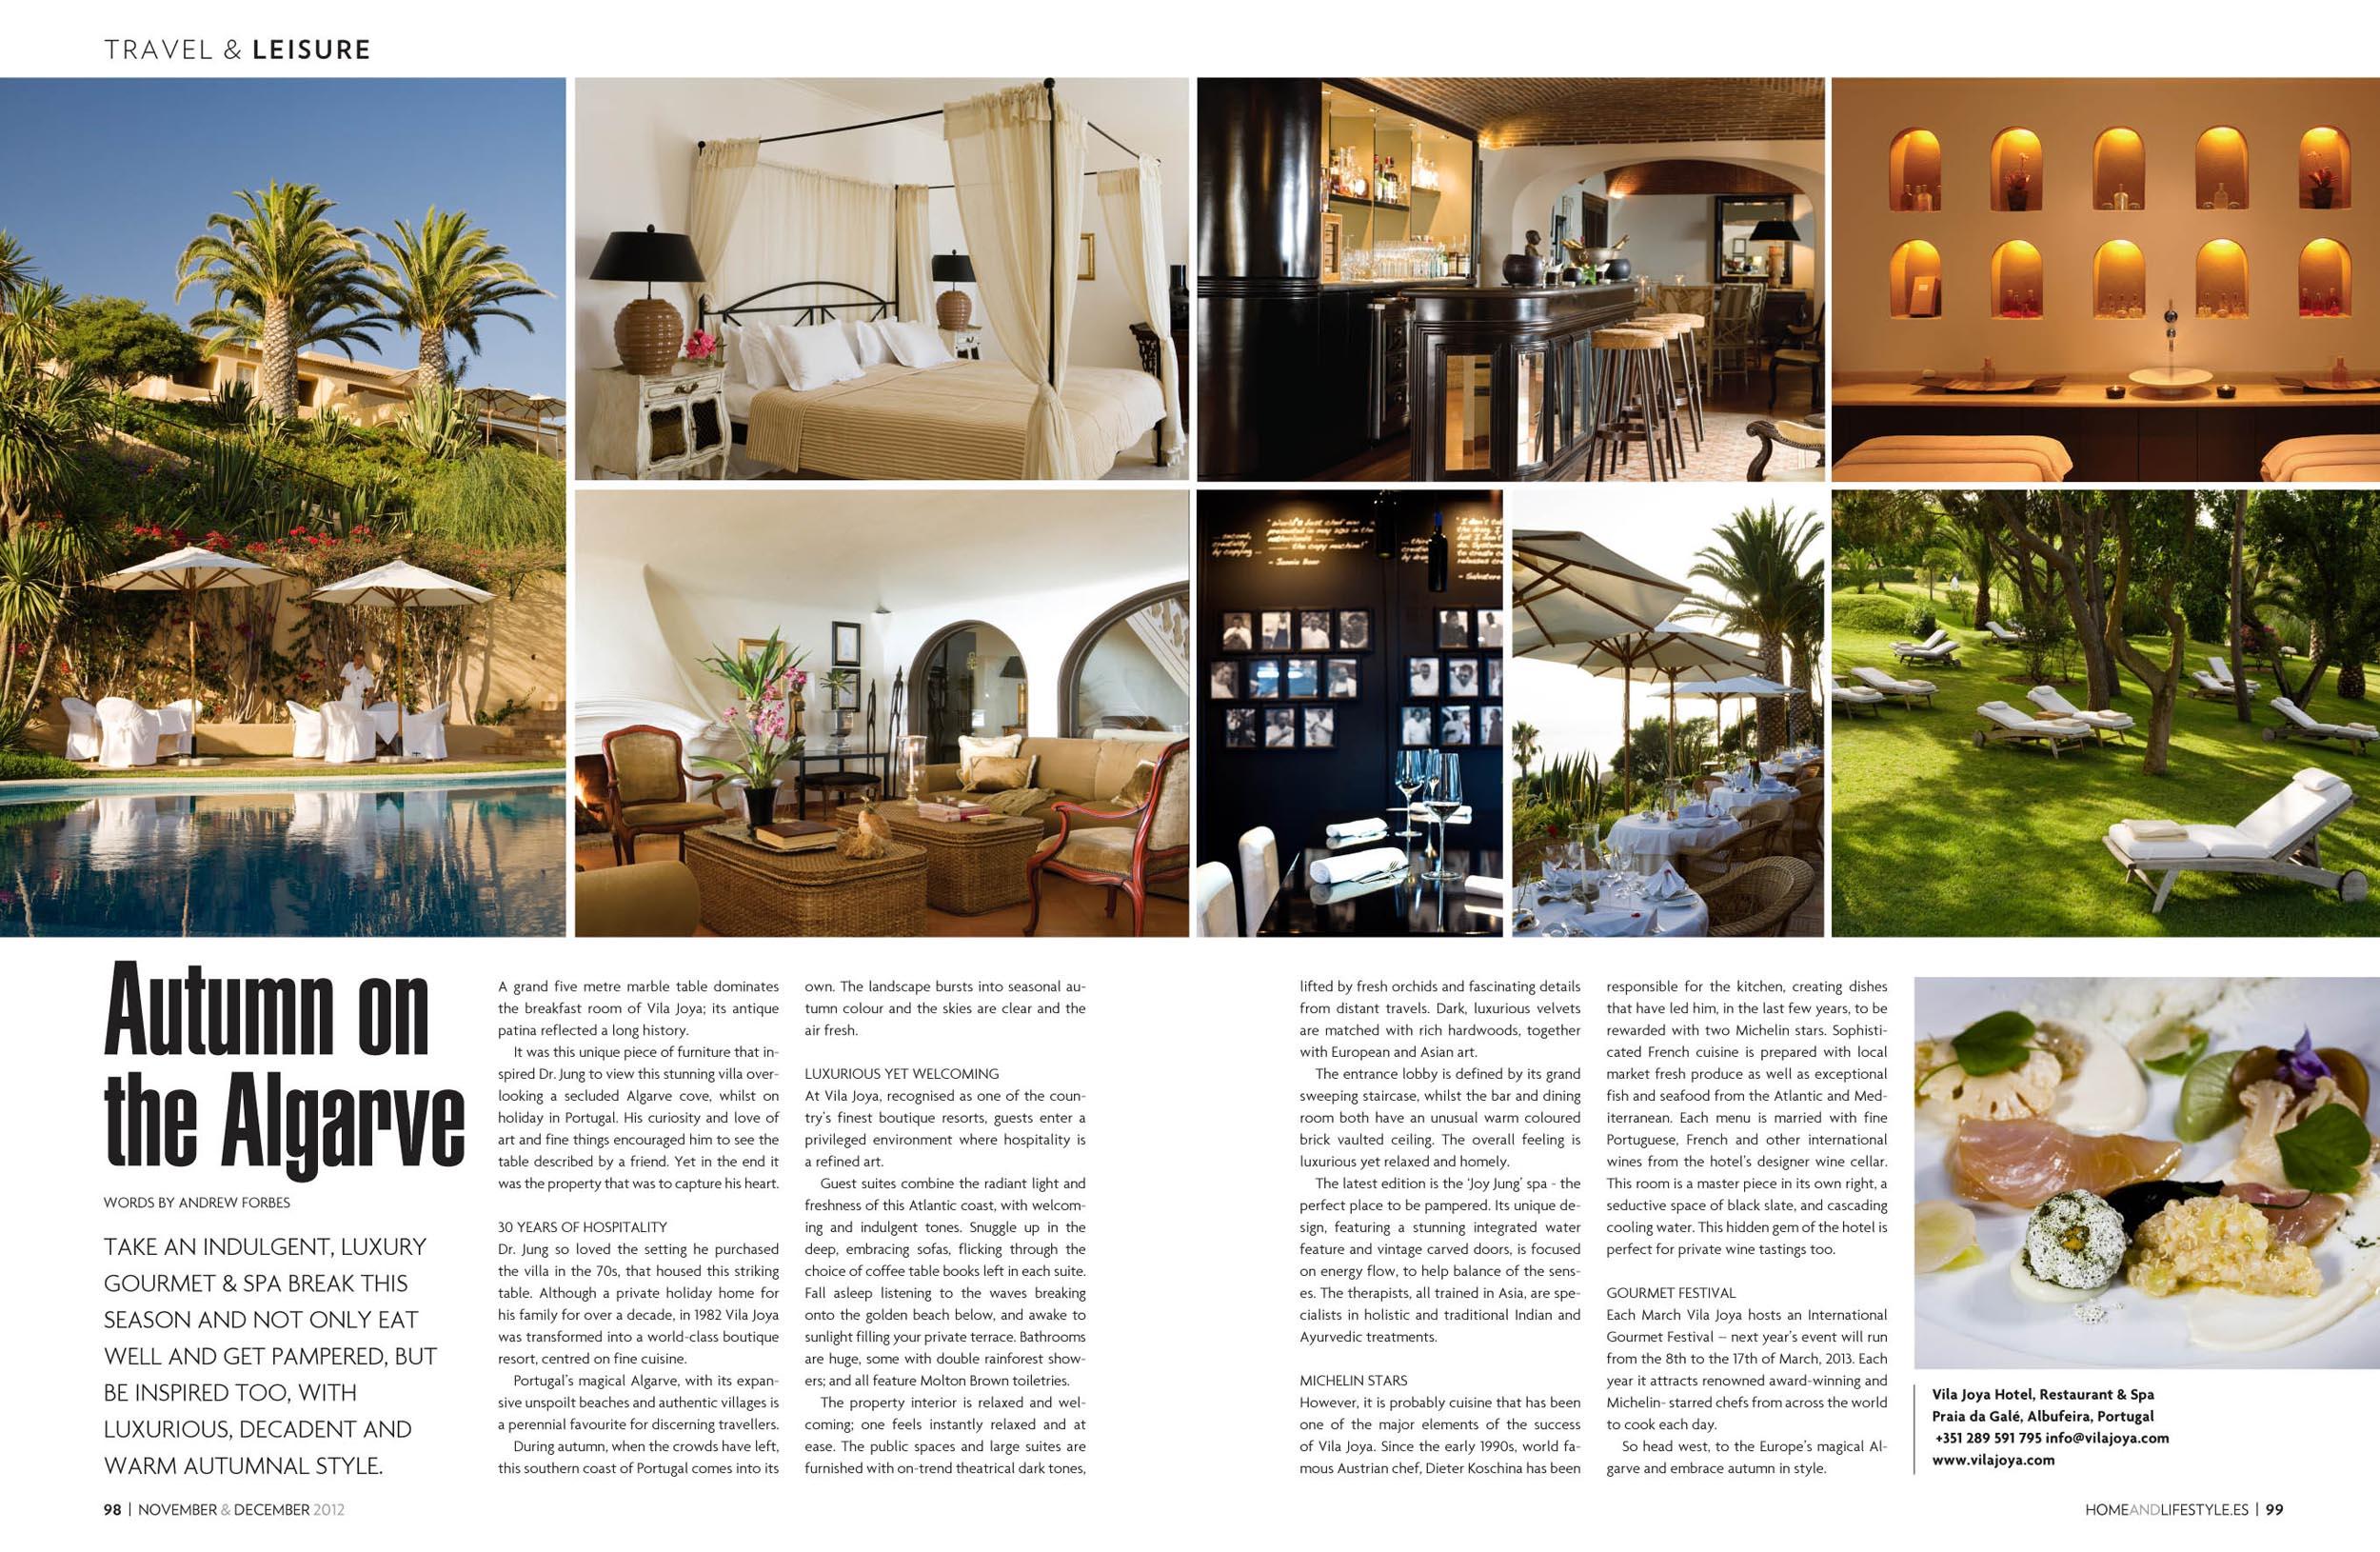 Autumn on the algarve vila joya portugal andrew forbes for Interior design magazine articles